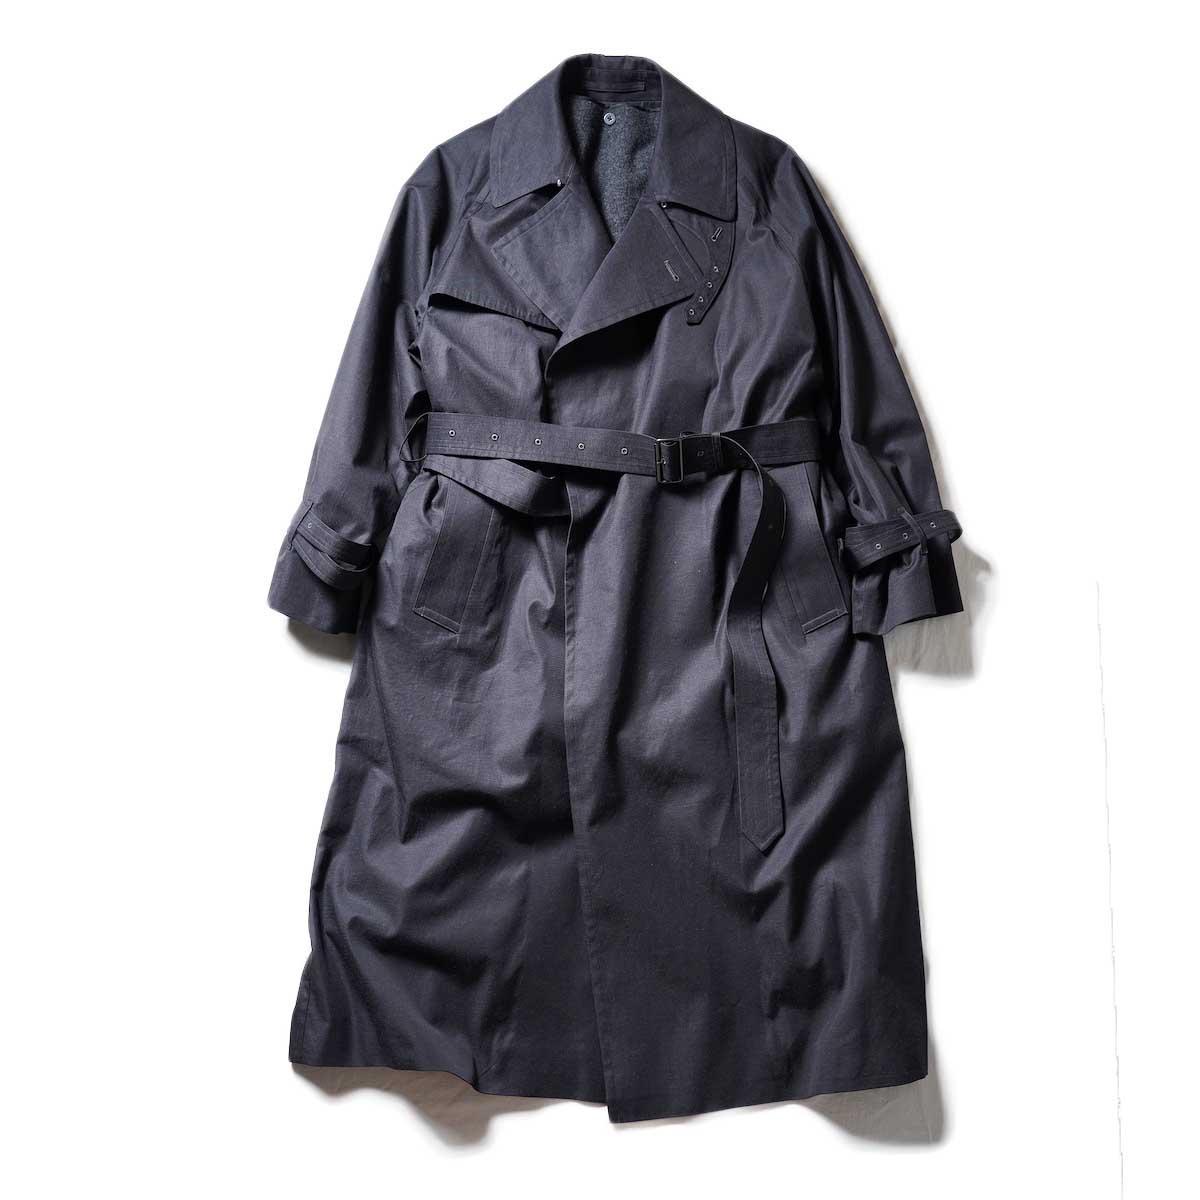 blurhms / Gabardine Double Belt Trench Coat (Heather Black)